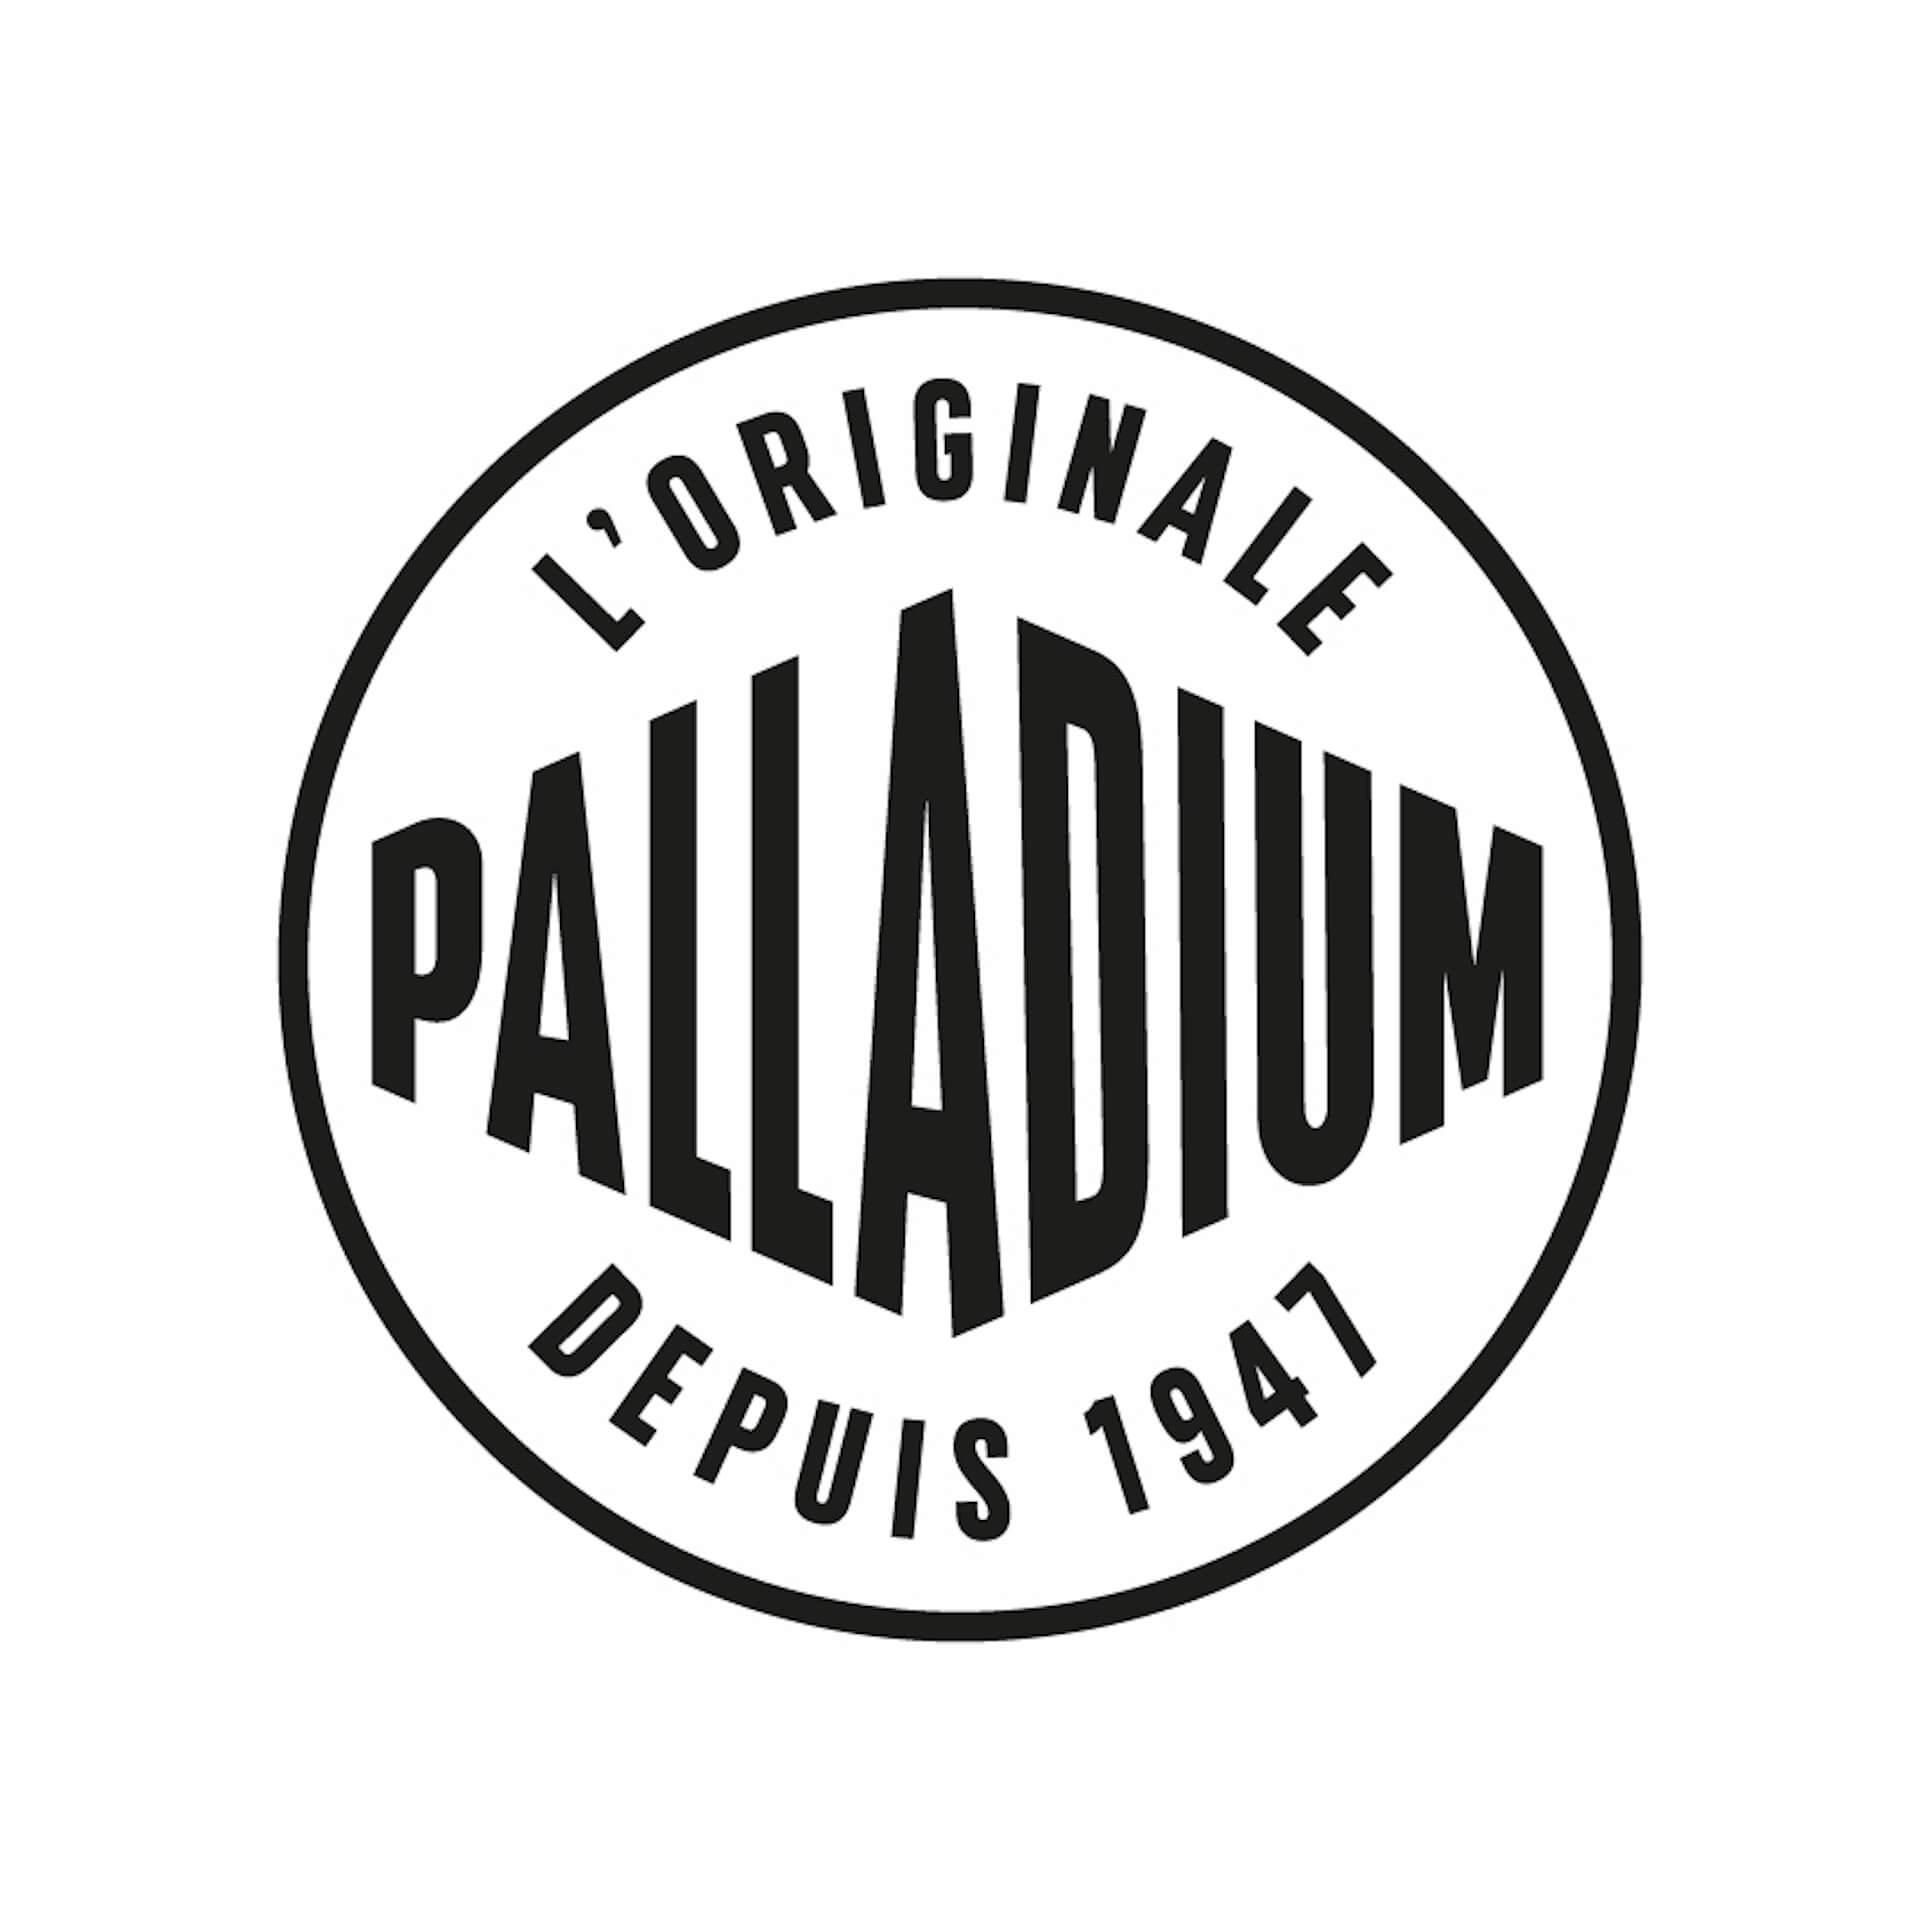 PALLADIUM徹底解剖|雨の日やアウトドア/フェスで大活躍するおしゃれな防水靴の秘密 Palladium